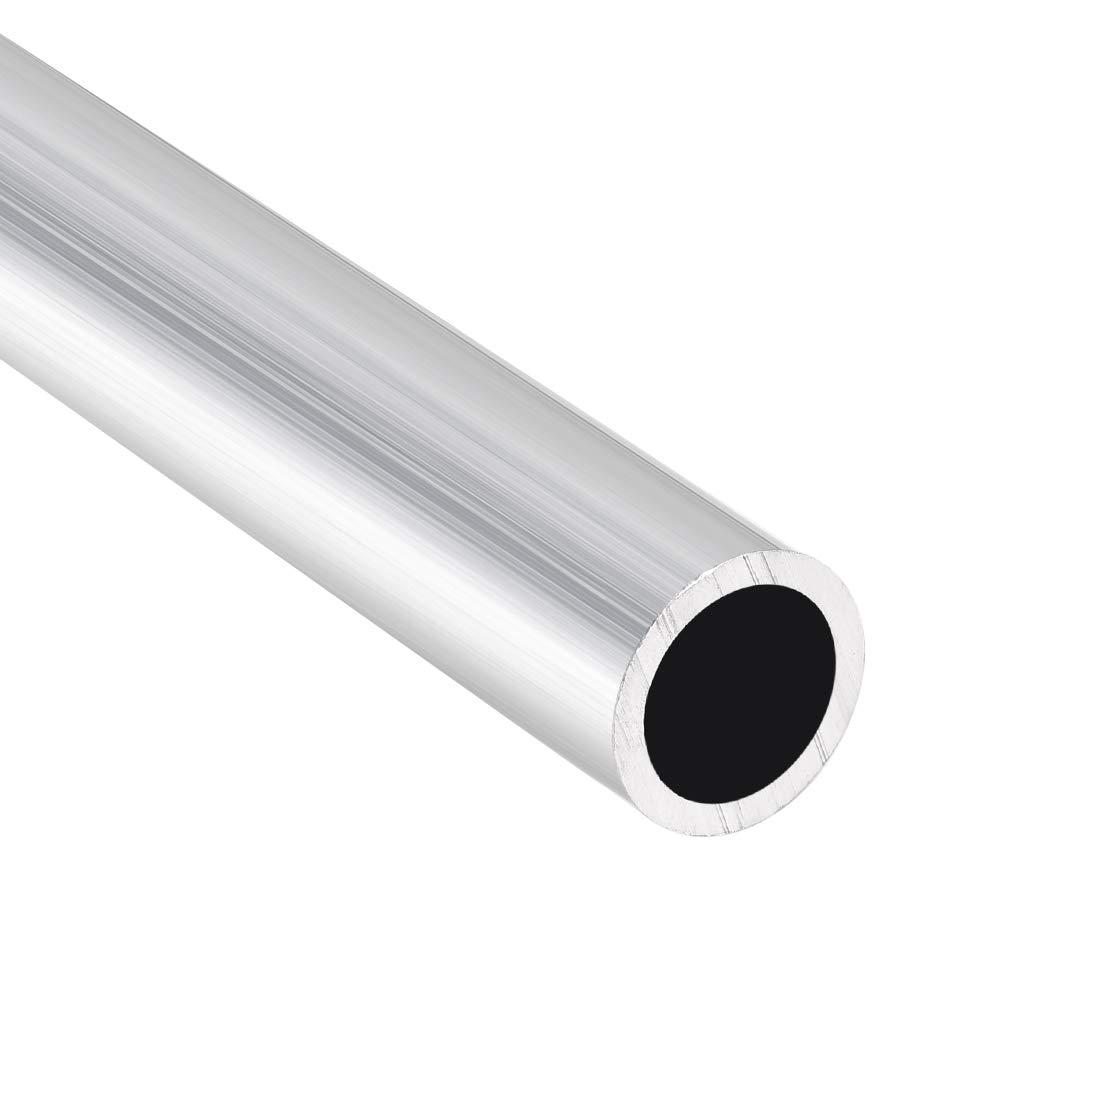 uxcell 6063 Aluminum Round Tube 300mm Length 13mm OD 10mm Inner Dia Seamless Aluminum Straight Tubing 2 Pcs